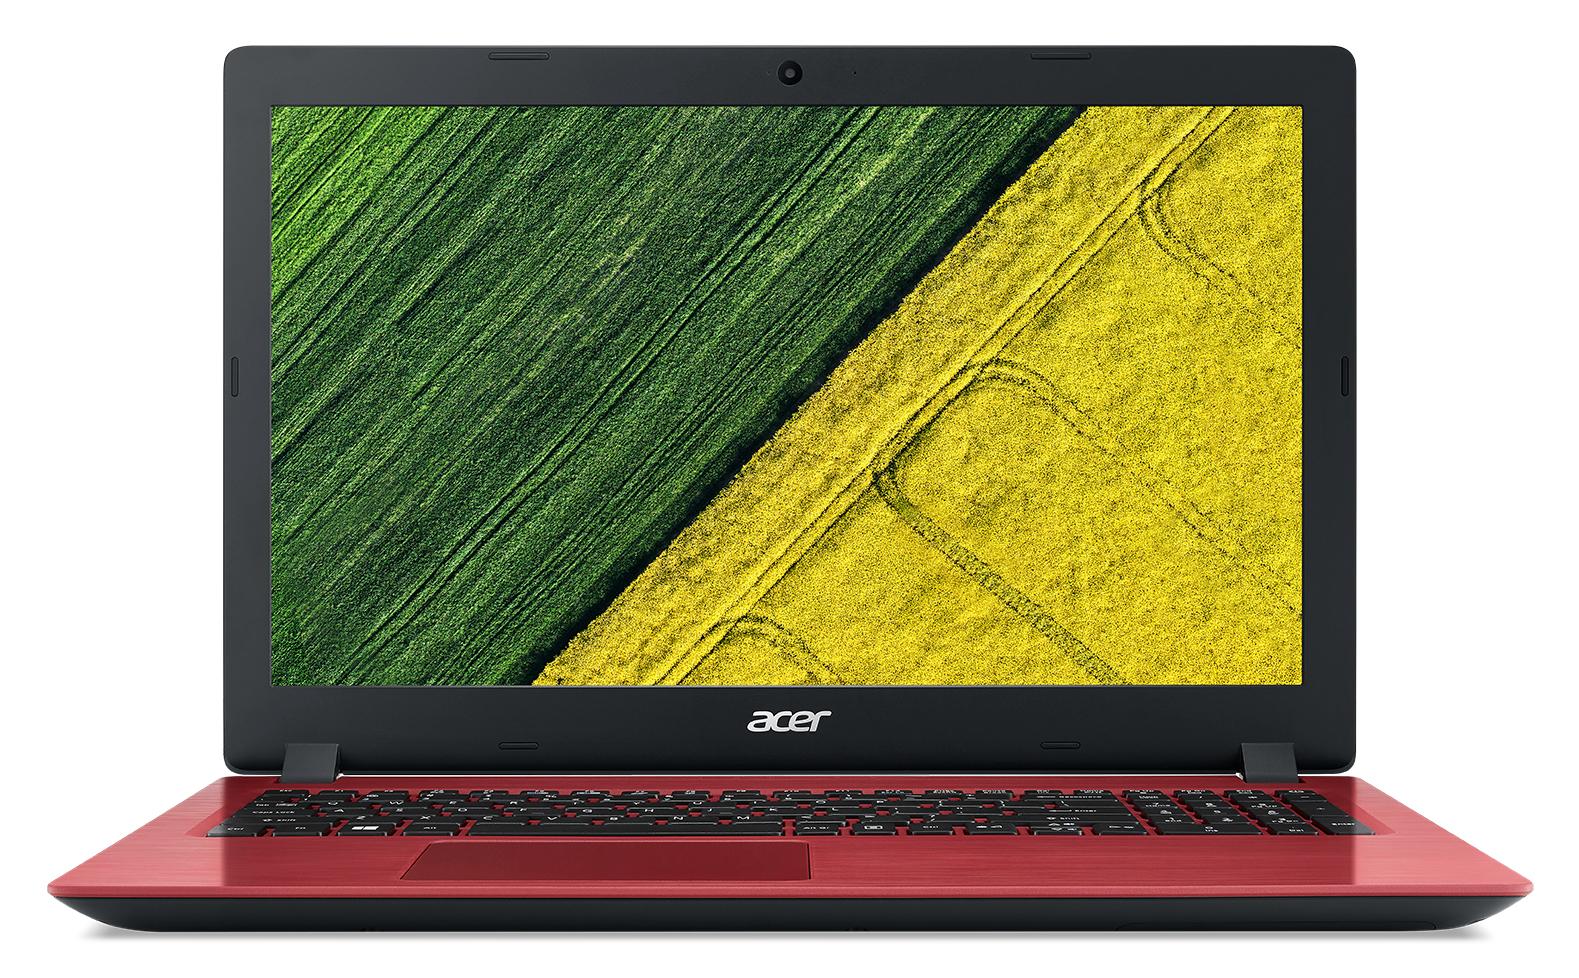 "Acer Aspire A315-51-341M 2GHz i3-6006U 15.6"" 1920 x 1080pixels Black, Red Notebook"